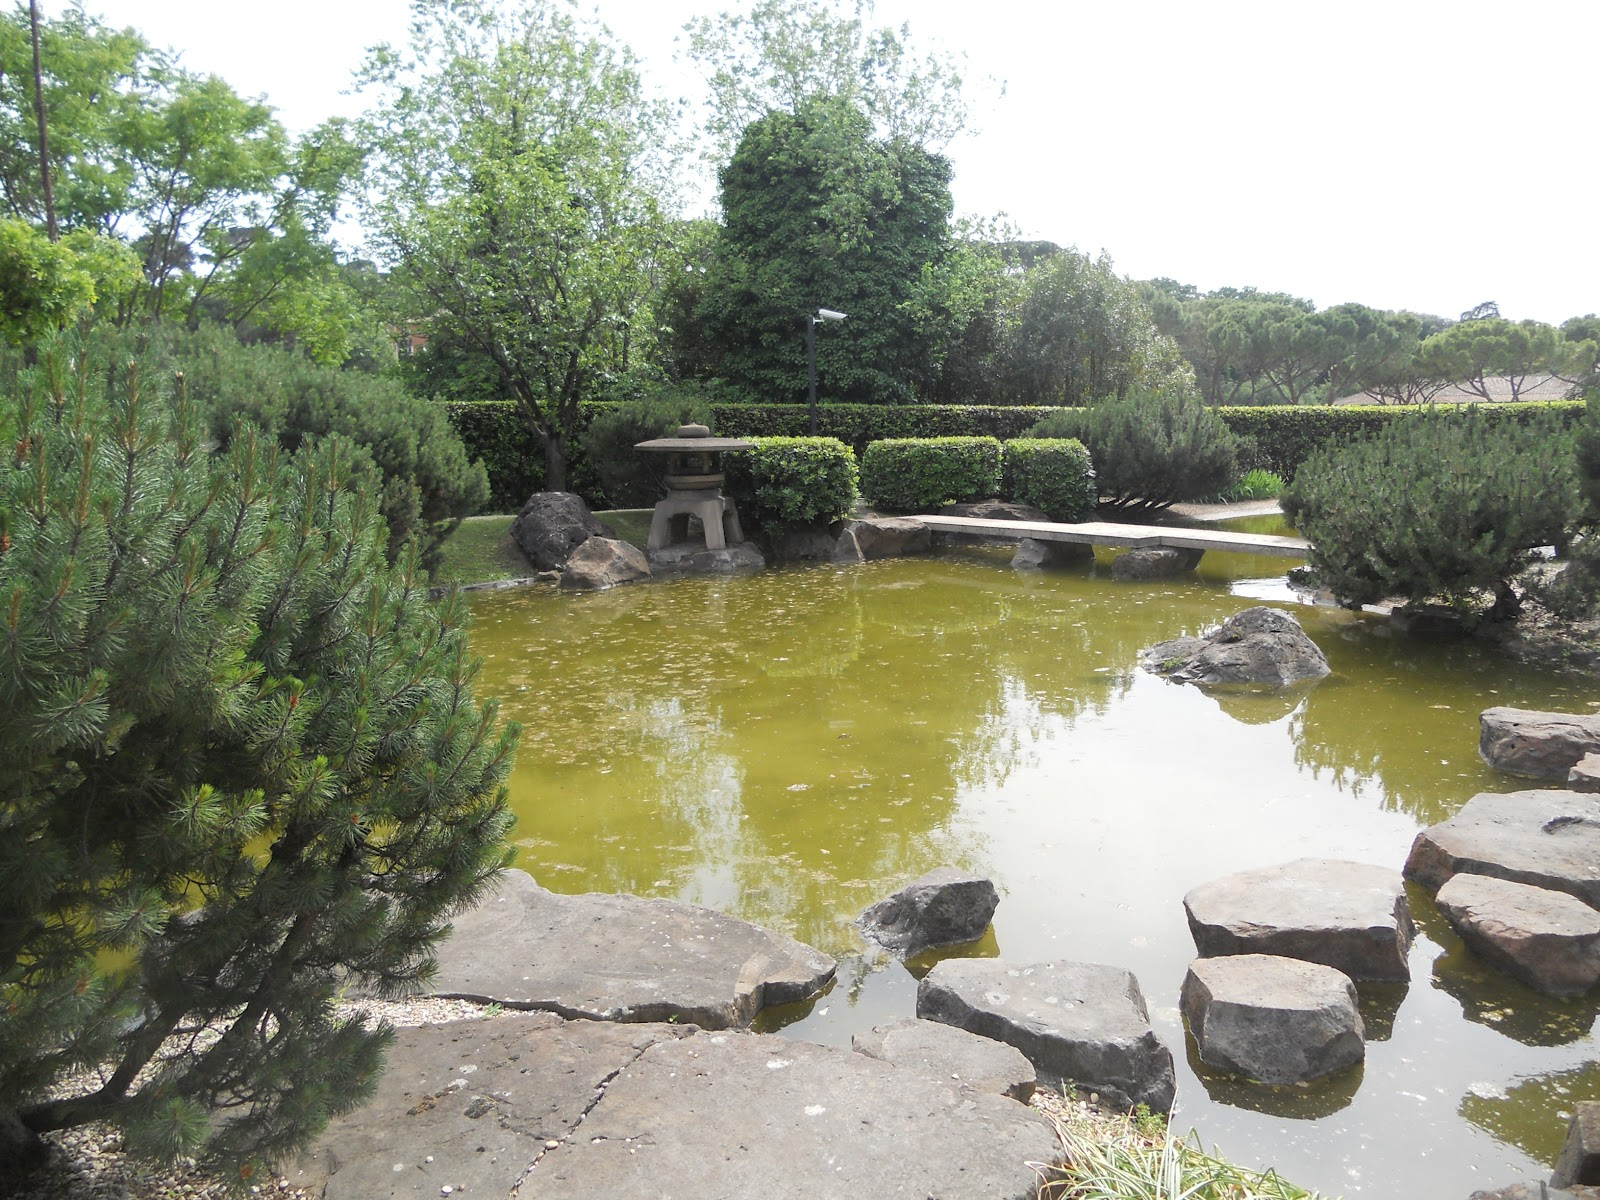 Curiosando giardino giapponese a roma - Piccolo giardino giapponese ...